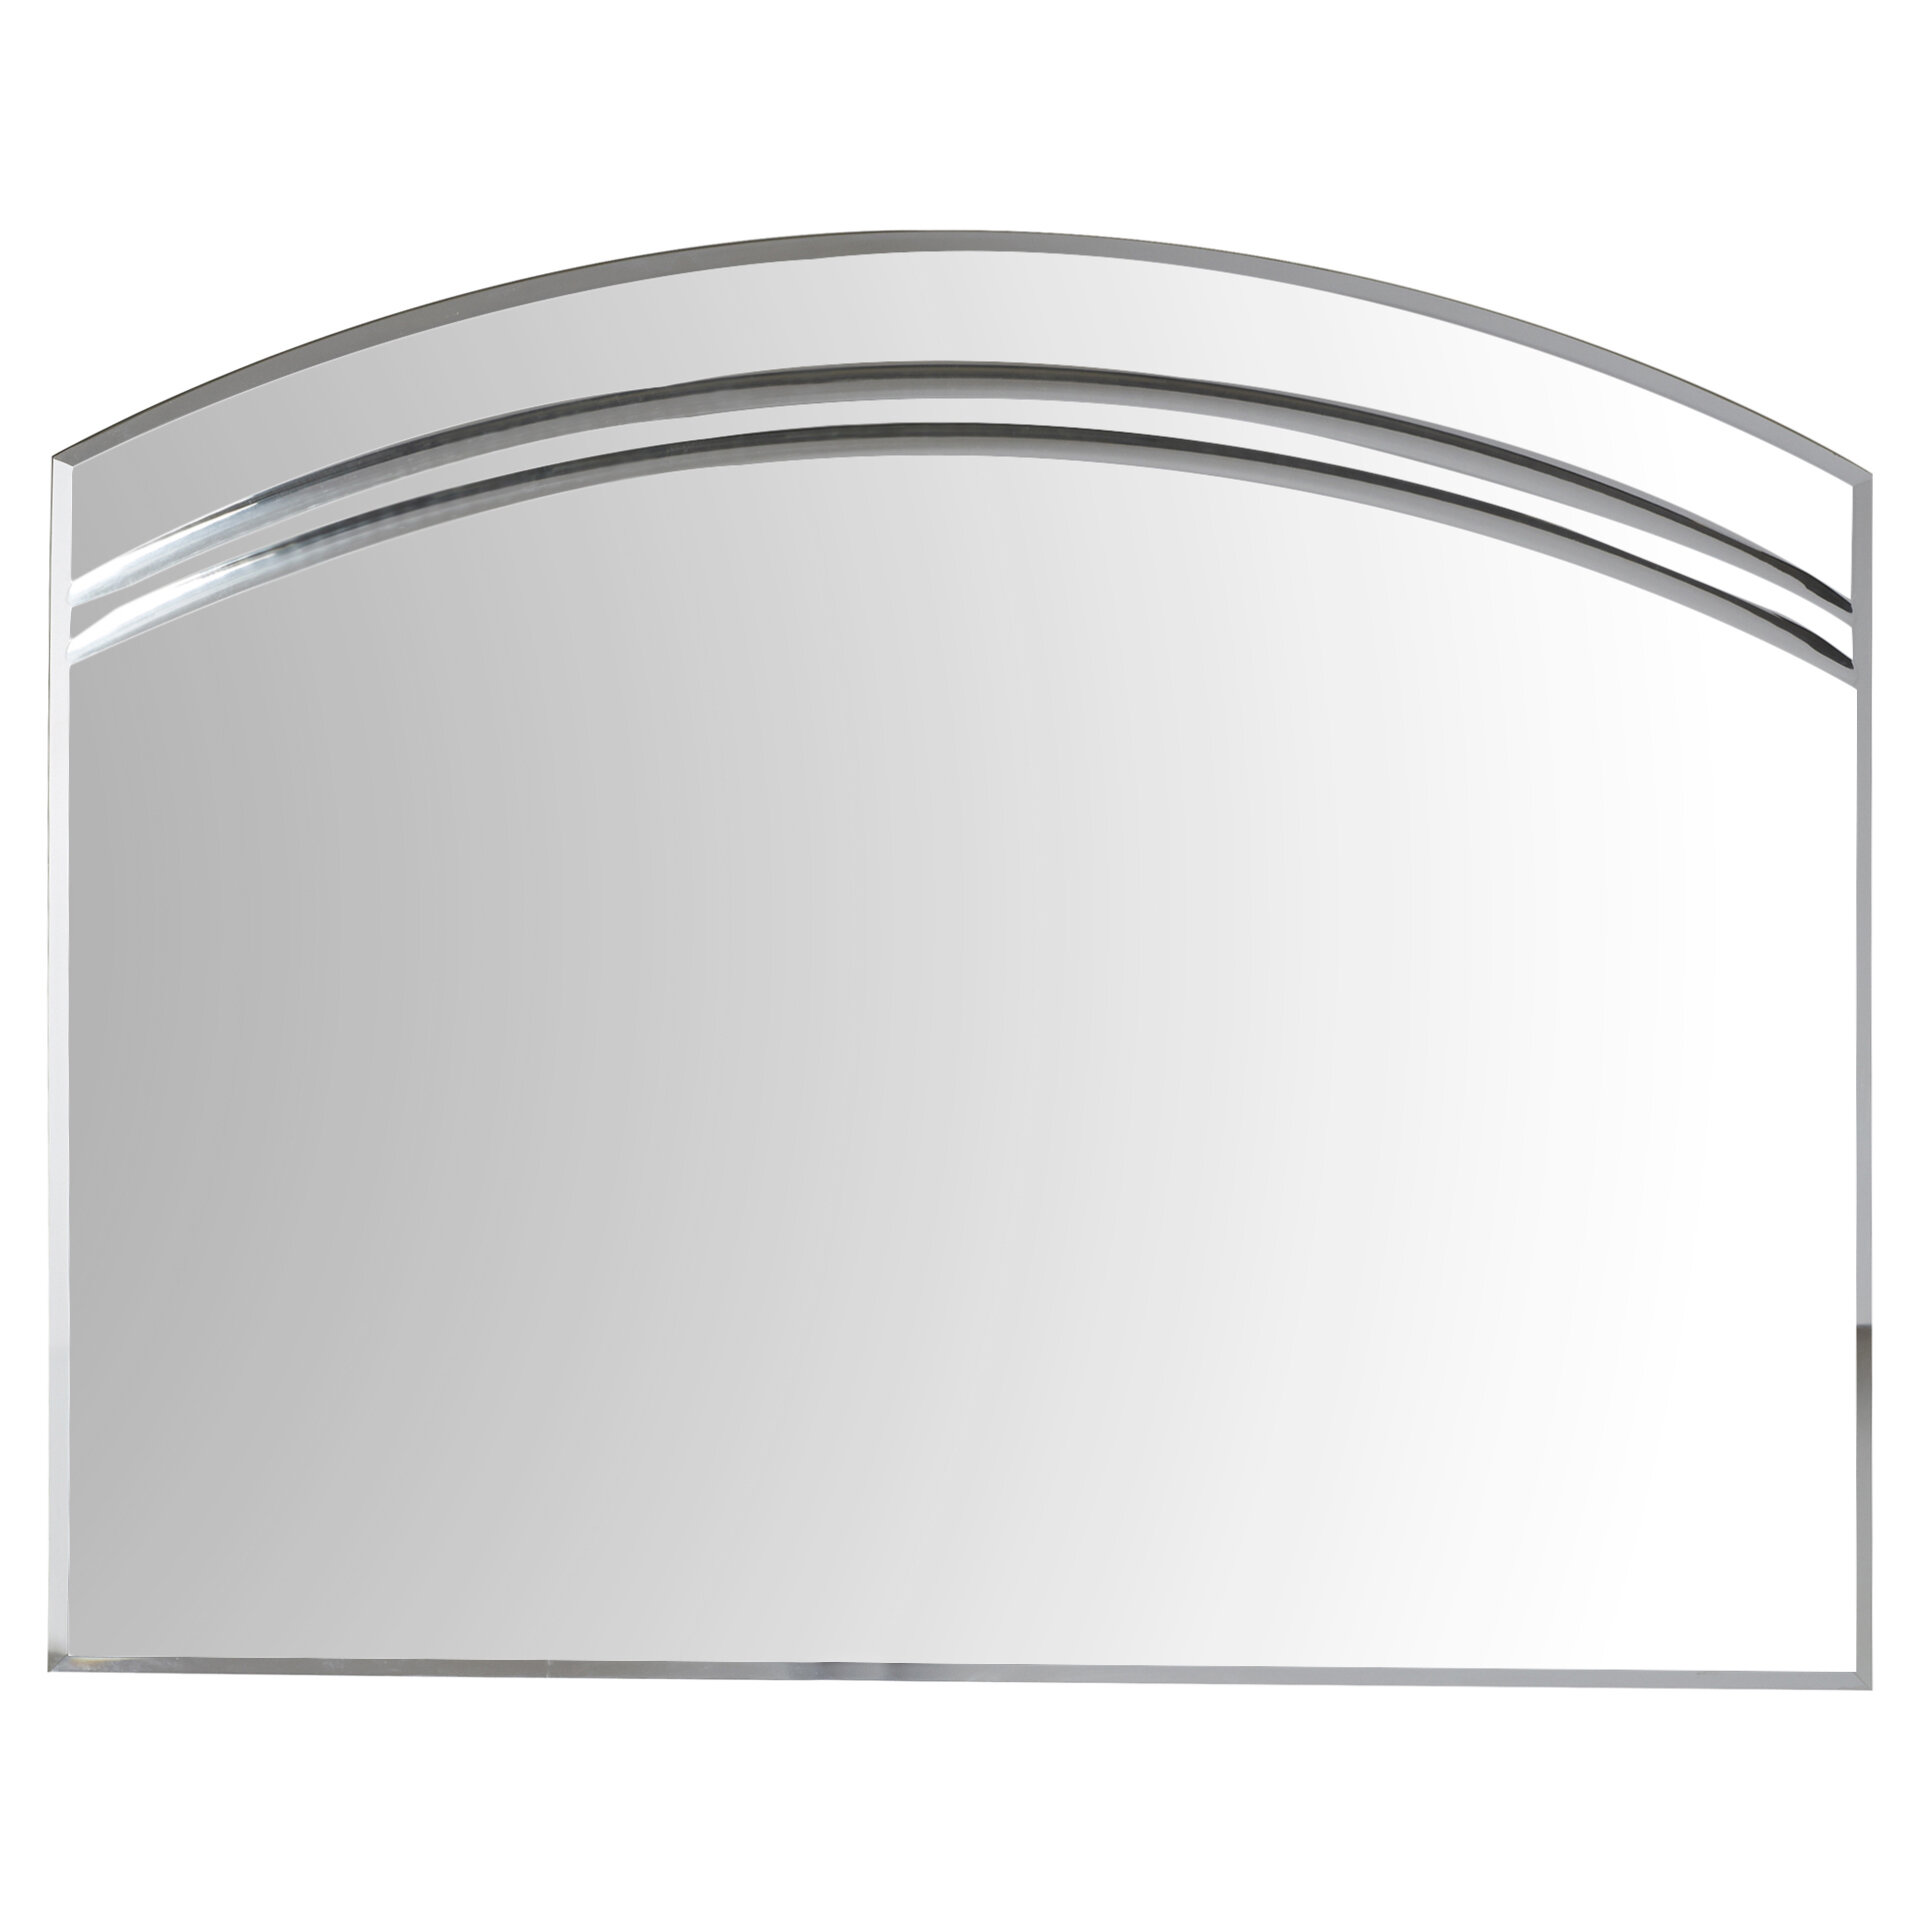 Wallingford Large Frameless Wall Mirror & Reviews | Joss & Main